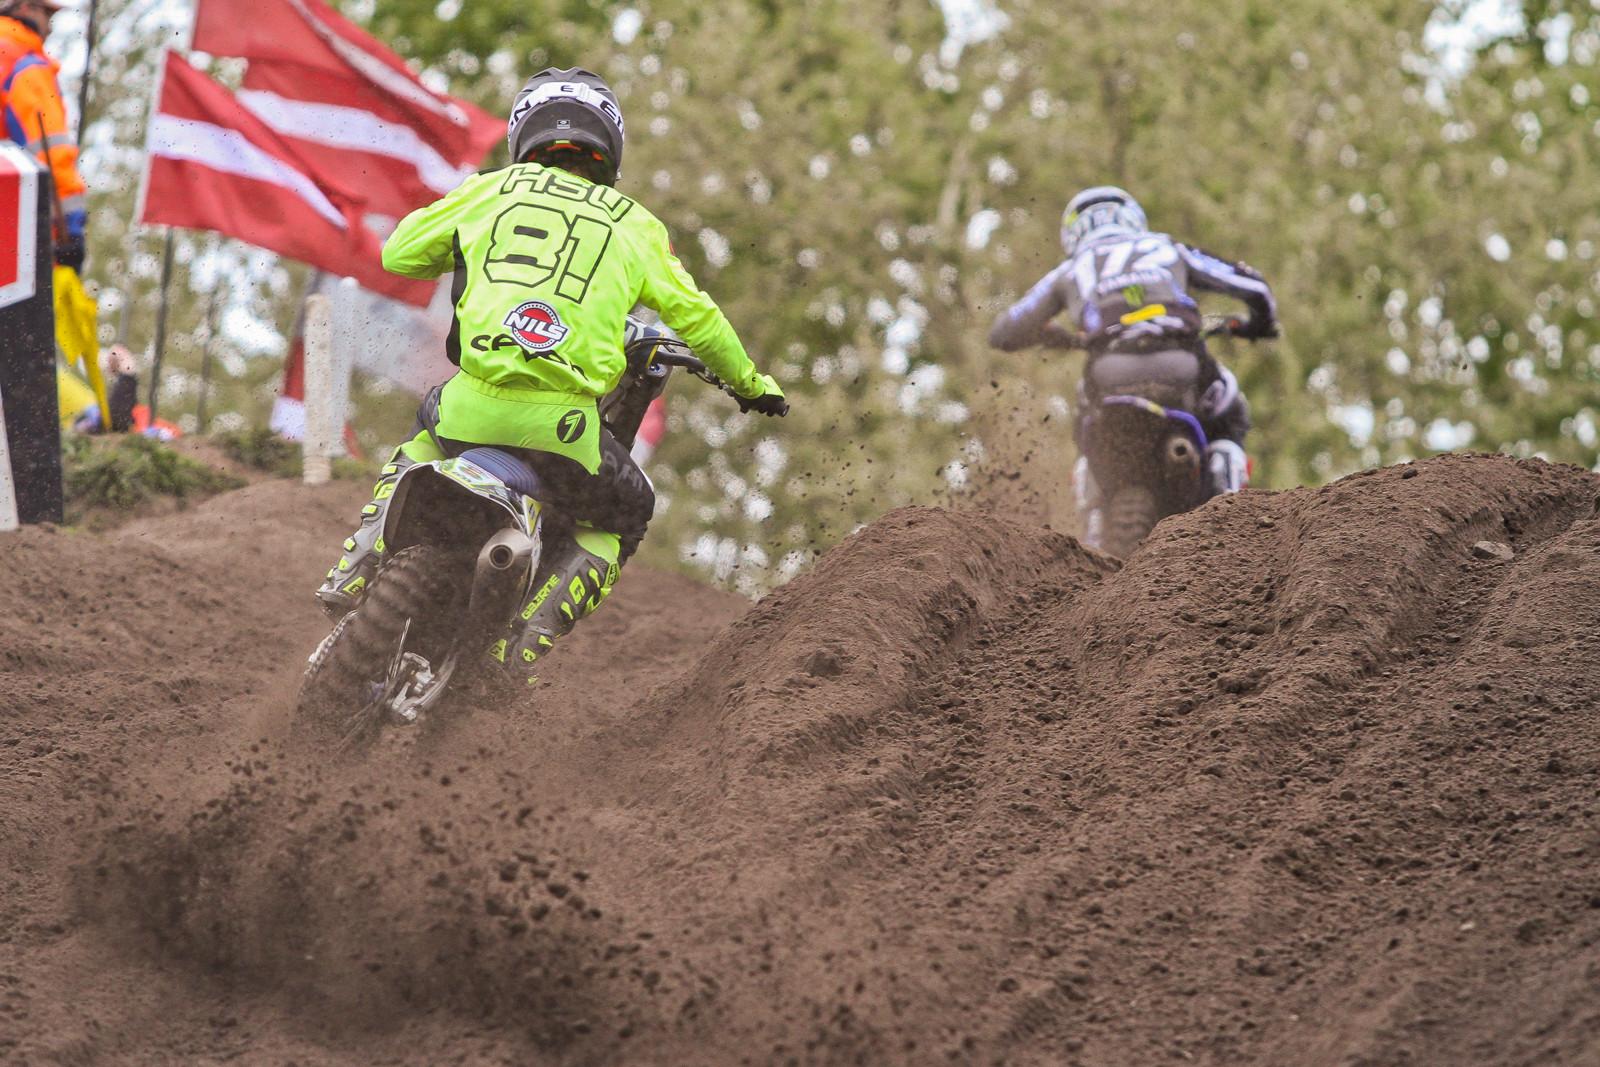 Brian Hsu - Photo Blast: 2017 MXGP of Valkenswaard - Motocross Pictures - Vital MX